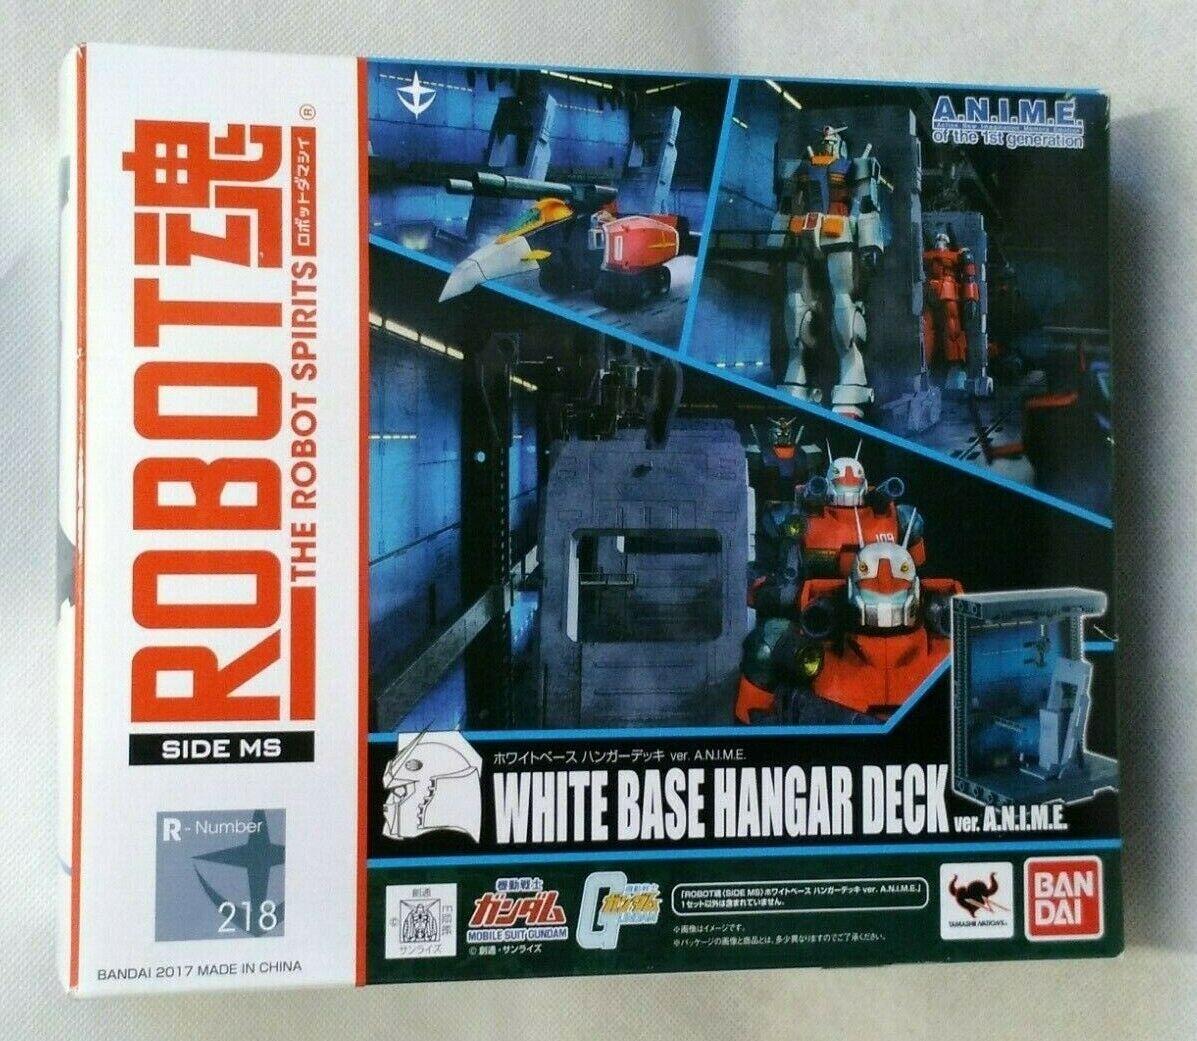 Robot Spirits  Mobile Gundam Côté Ms Base Blanche Cintre Pont Ver. A. N. I. M.E  À ne pas manquer!